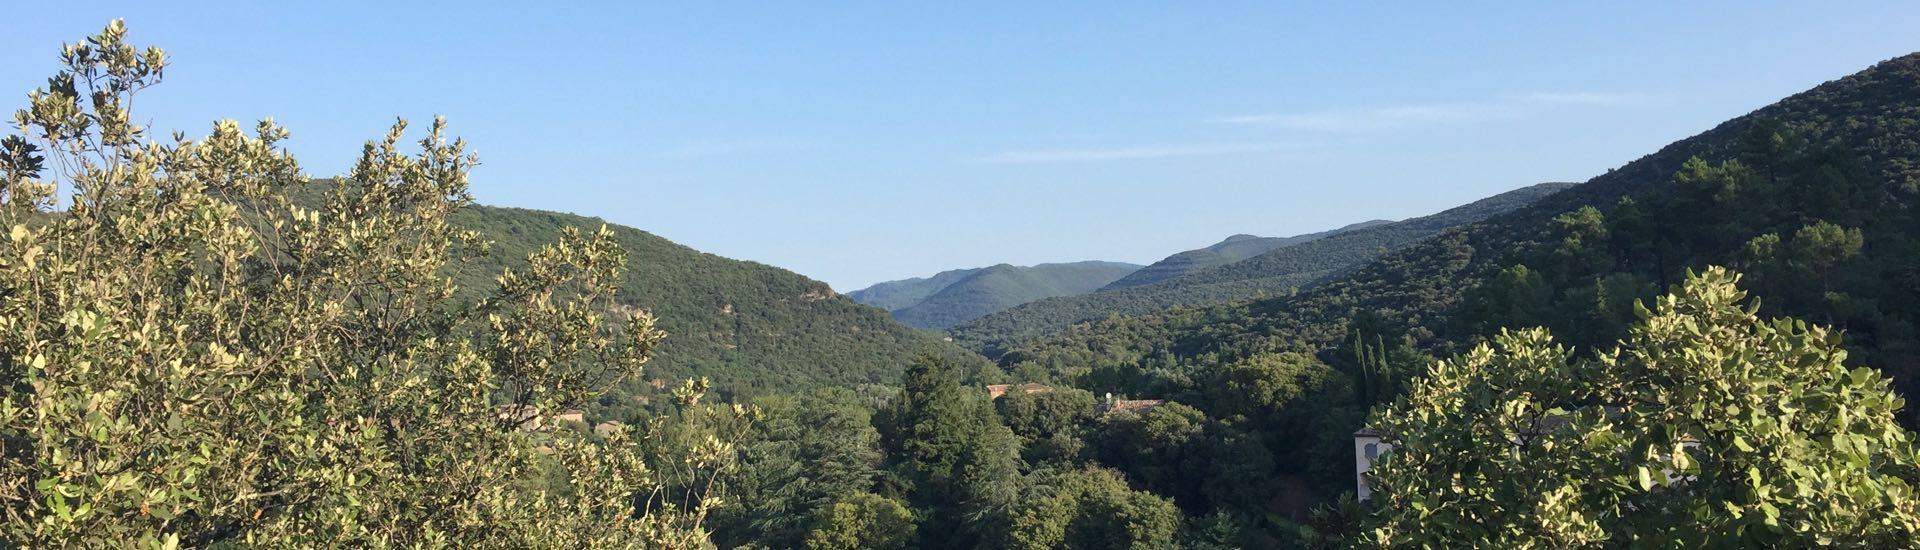 Campingplatz Provence Cevennes, Sommer 2016